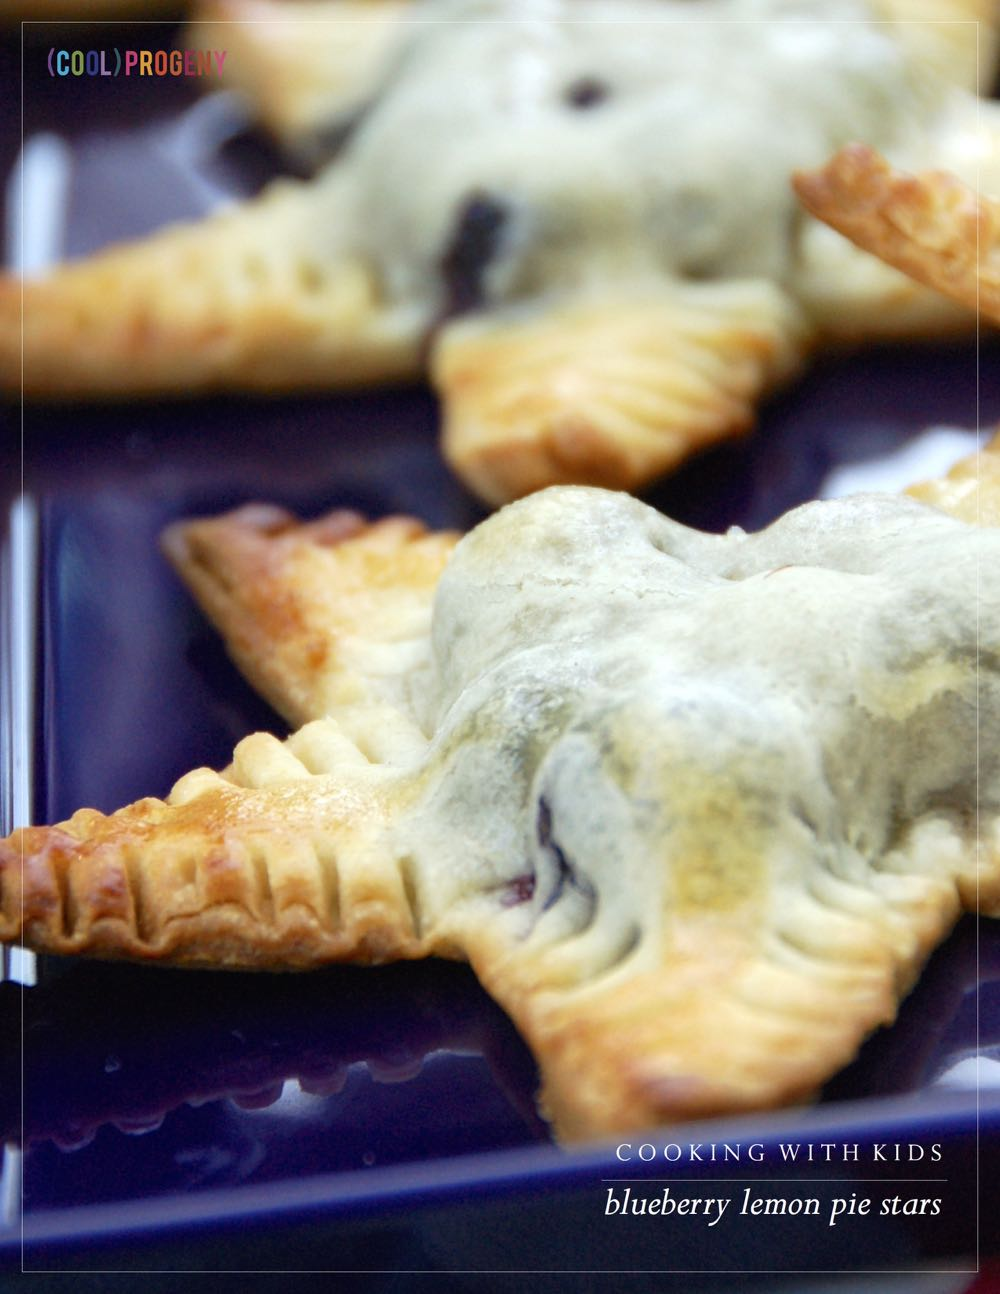 Blueberry Lemon Pie Stars - (cool) progeny